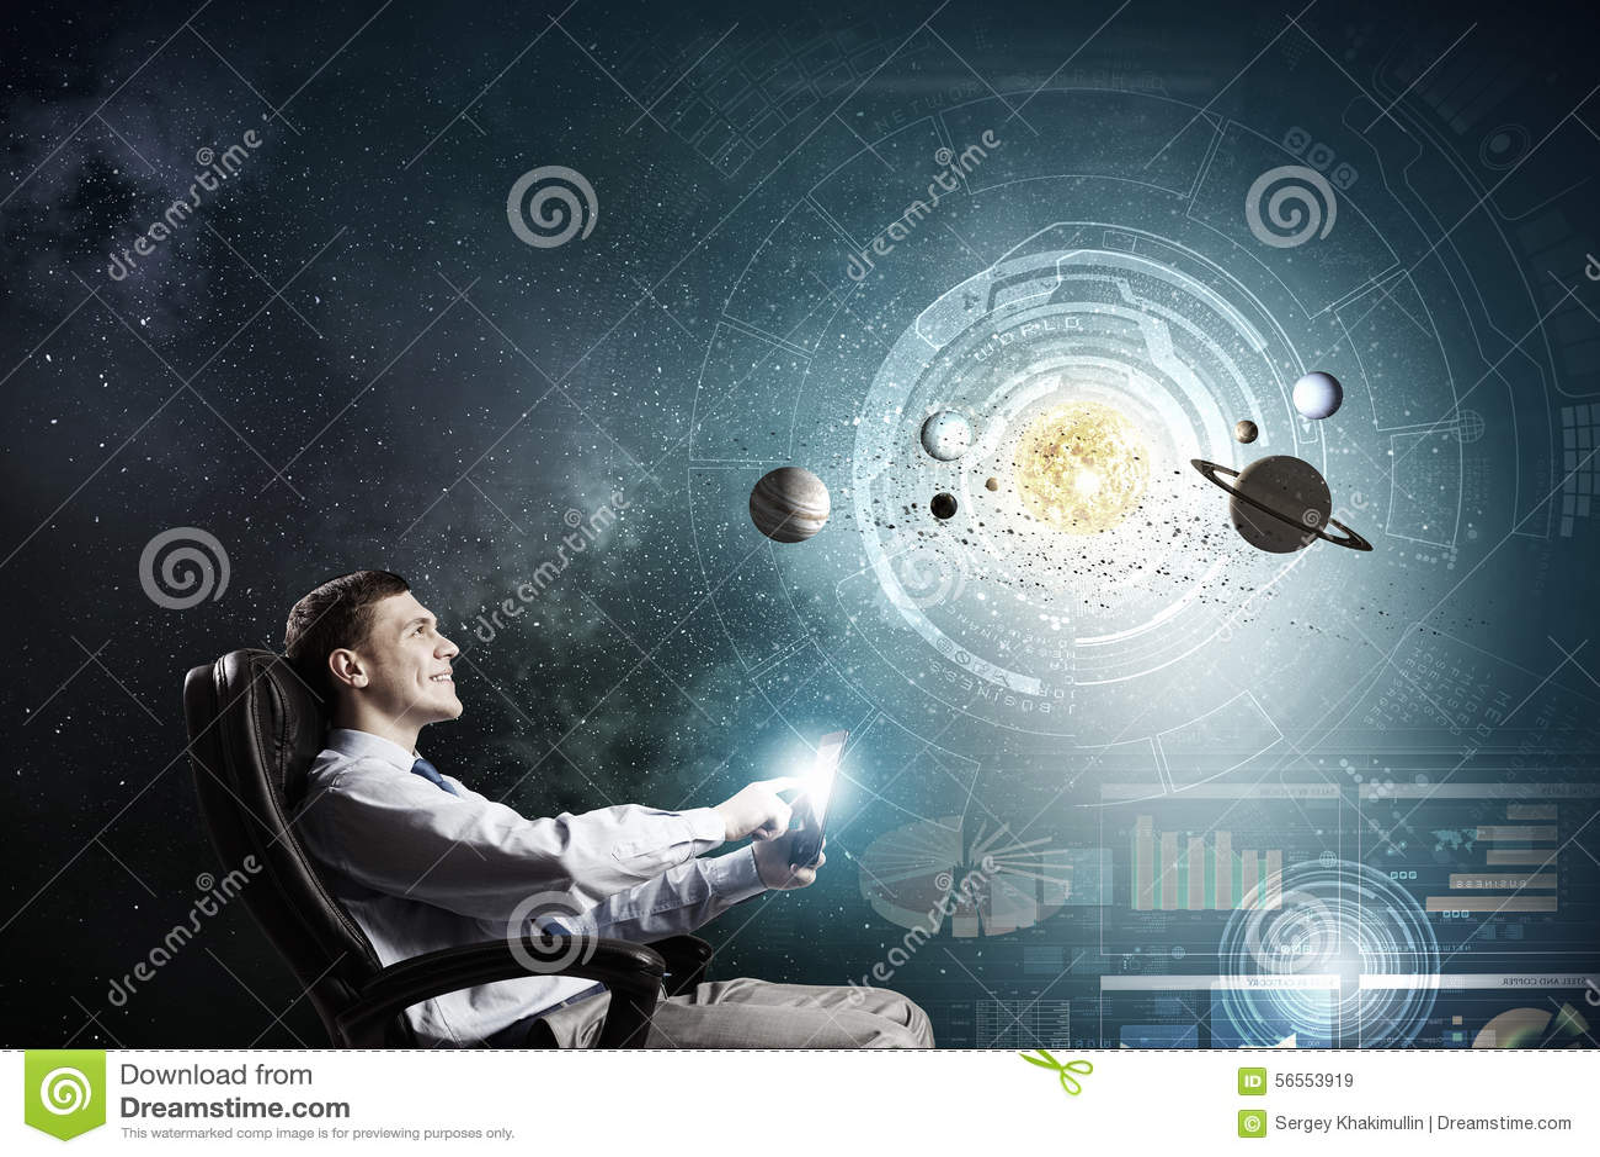 Download Άτομο που ερευνά το διάστημα Στοκ Εικόνα - εικόνα από κόσμος, φως: 56553919